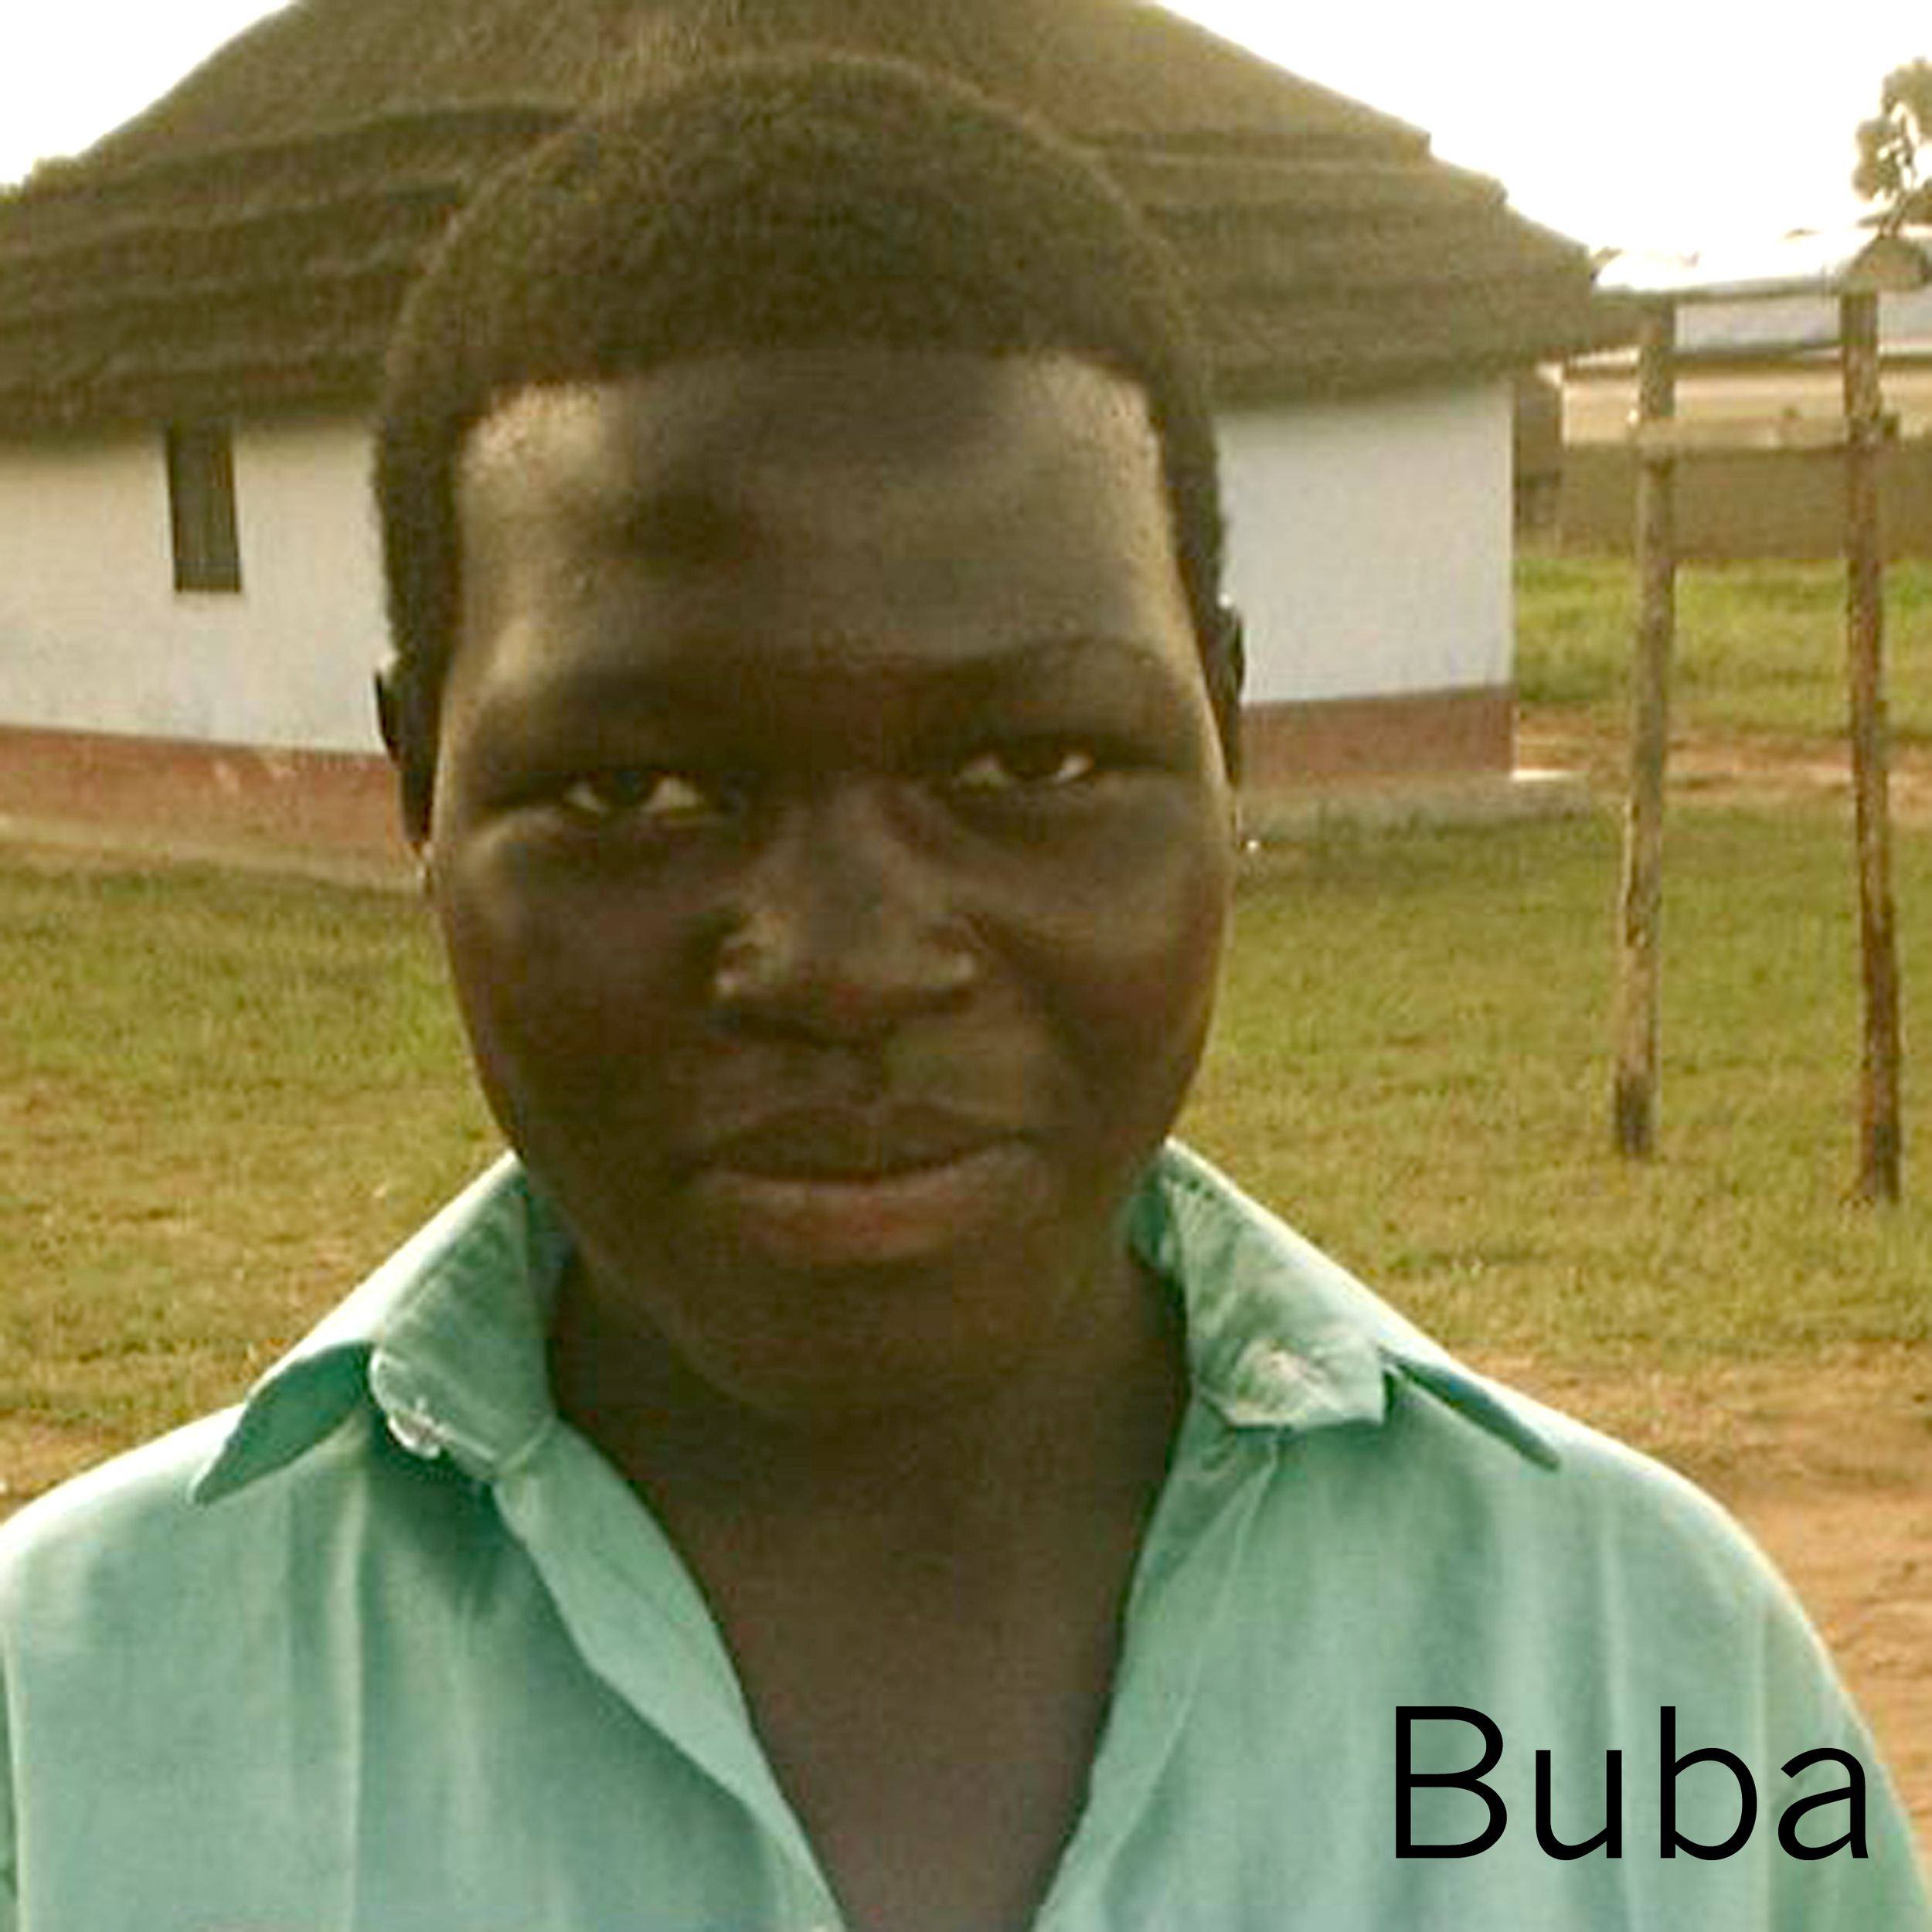 buba001_Name.jpg